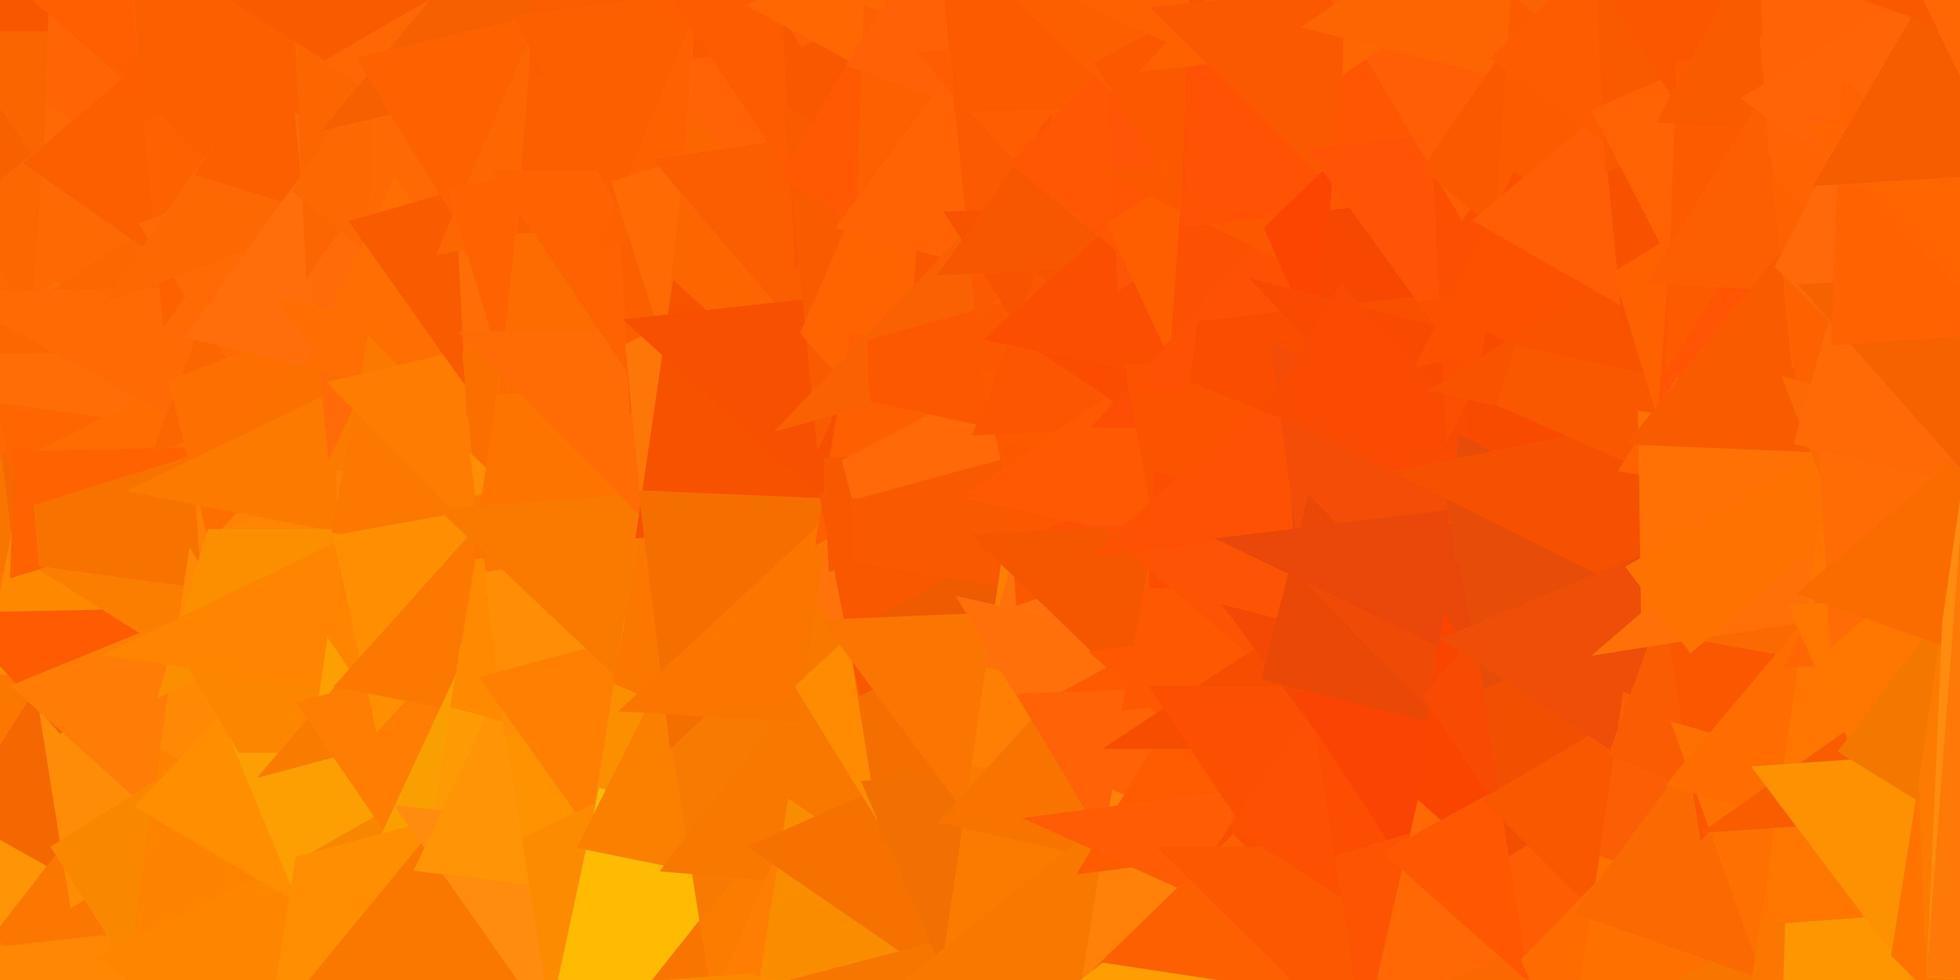 dunkelorange Vektor Dreieck Mosaik Design.